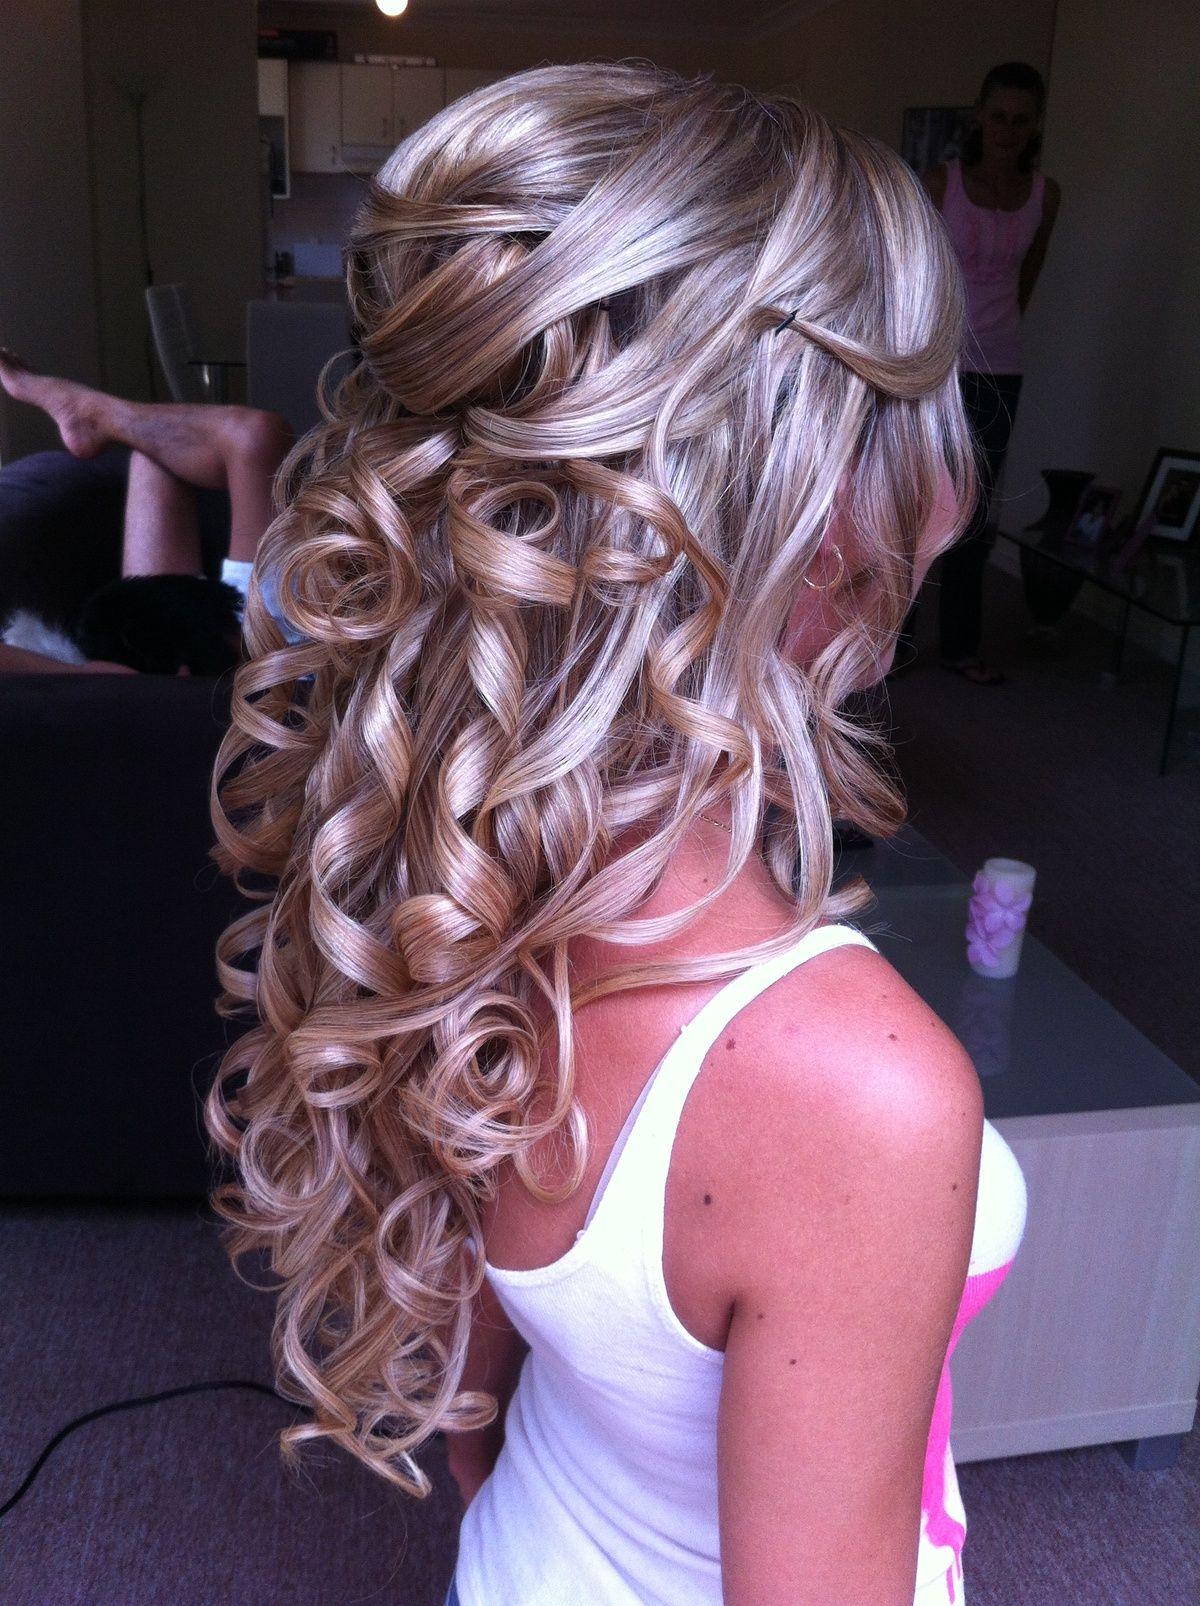 Afbdeabcedeg pixels hairstyles